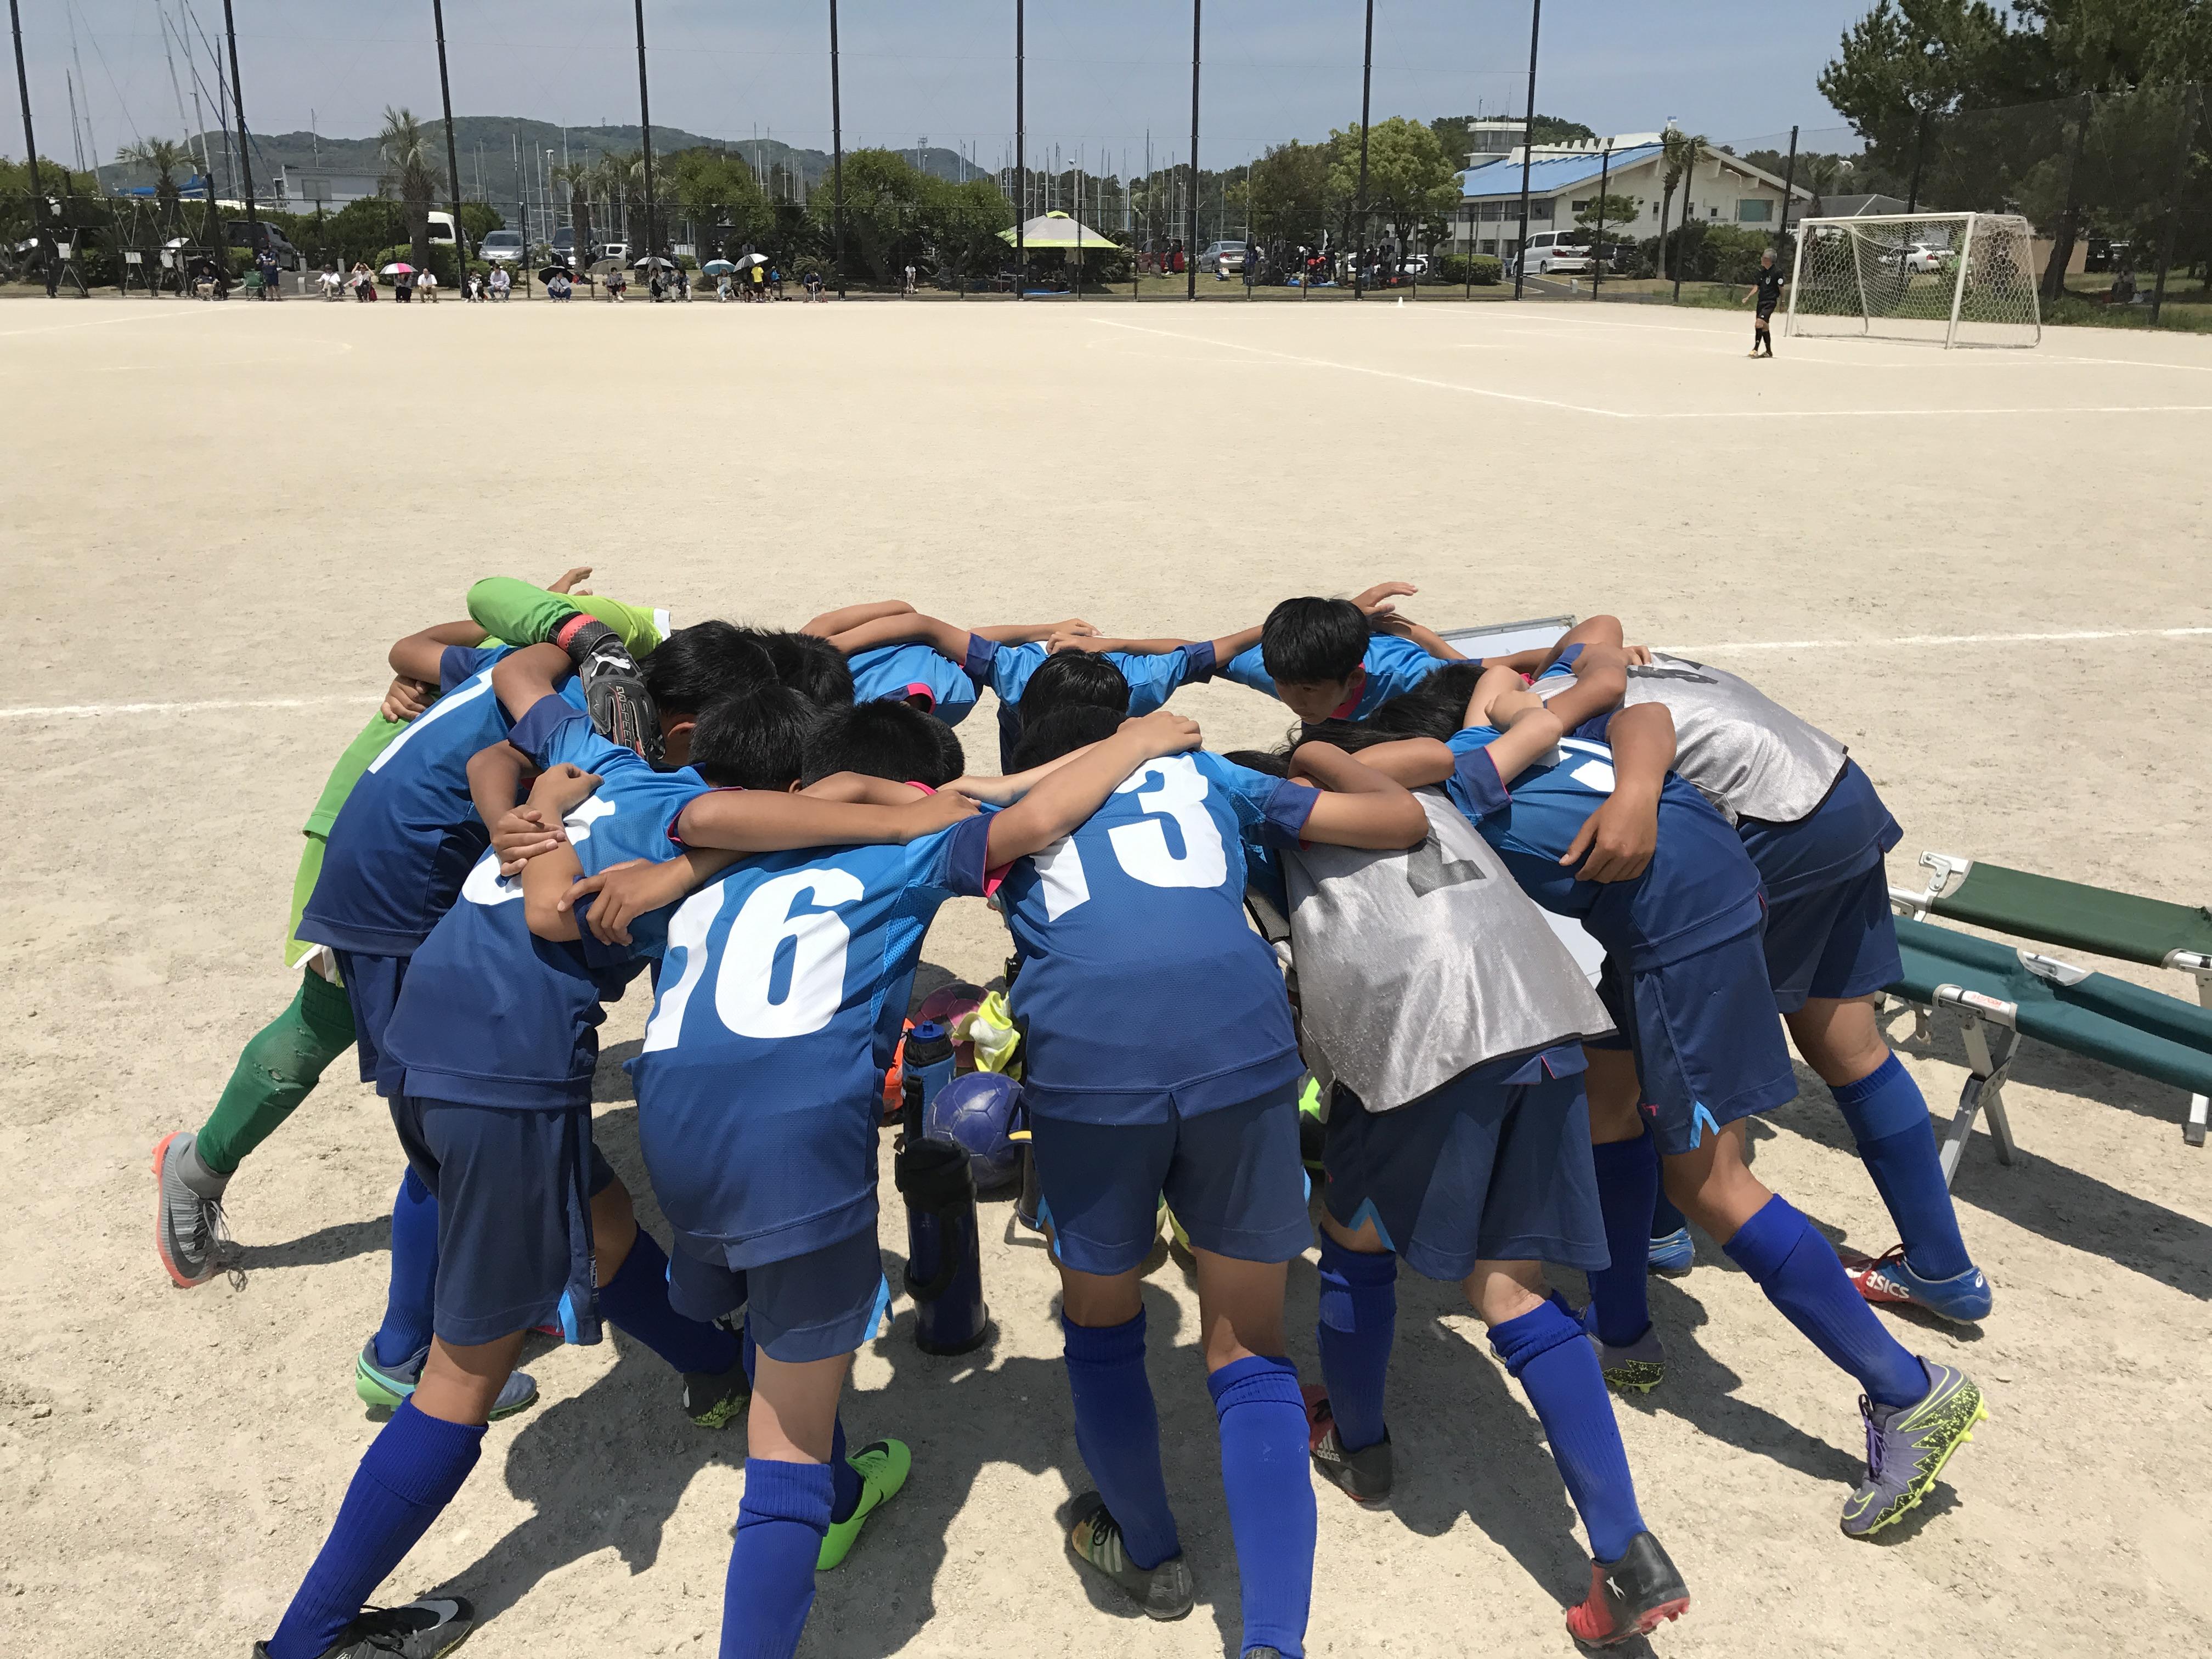 U-12 1st 福岡地区2部リーグ vs 那珂南・J-WIN 勝ちきれない試合が続く中で今日の結果は!?